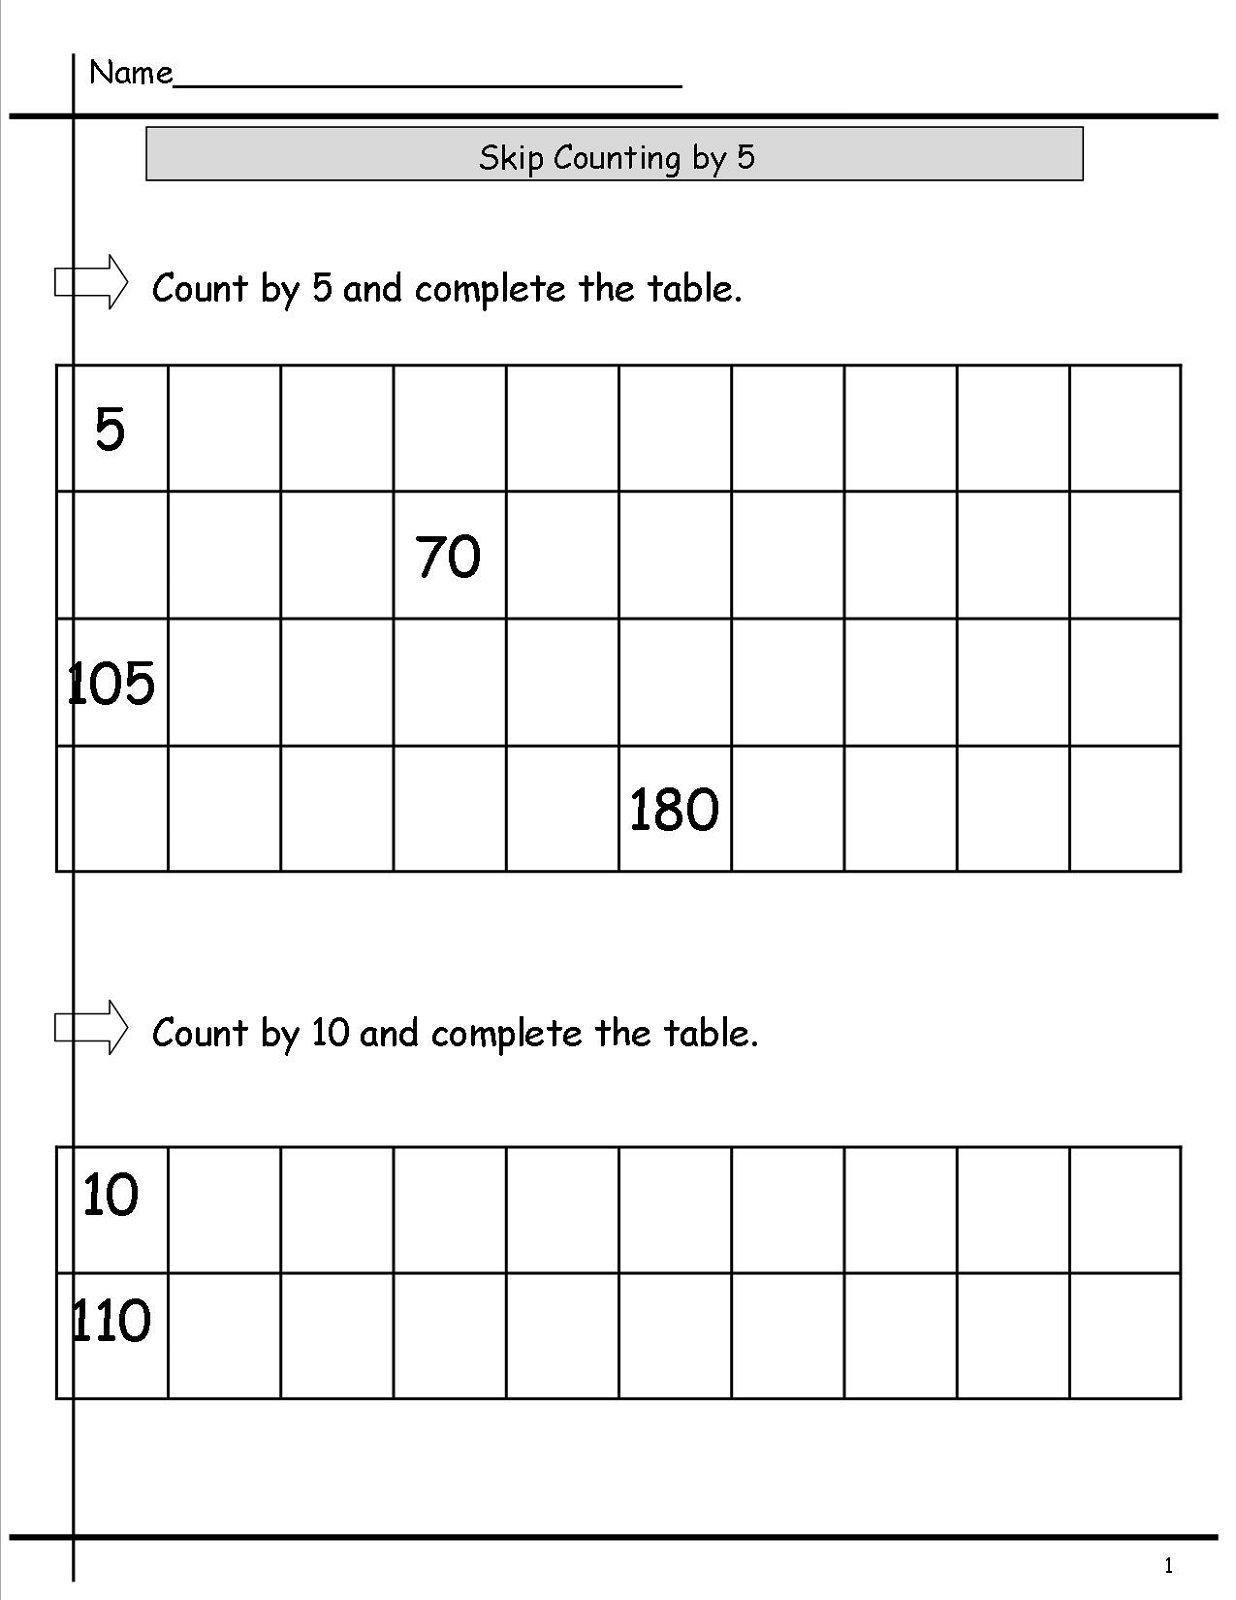 skip count by 5 worksheet